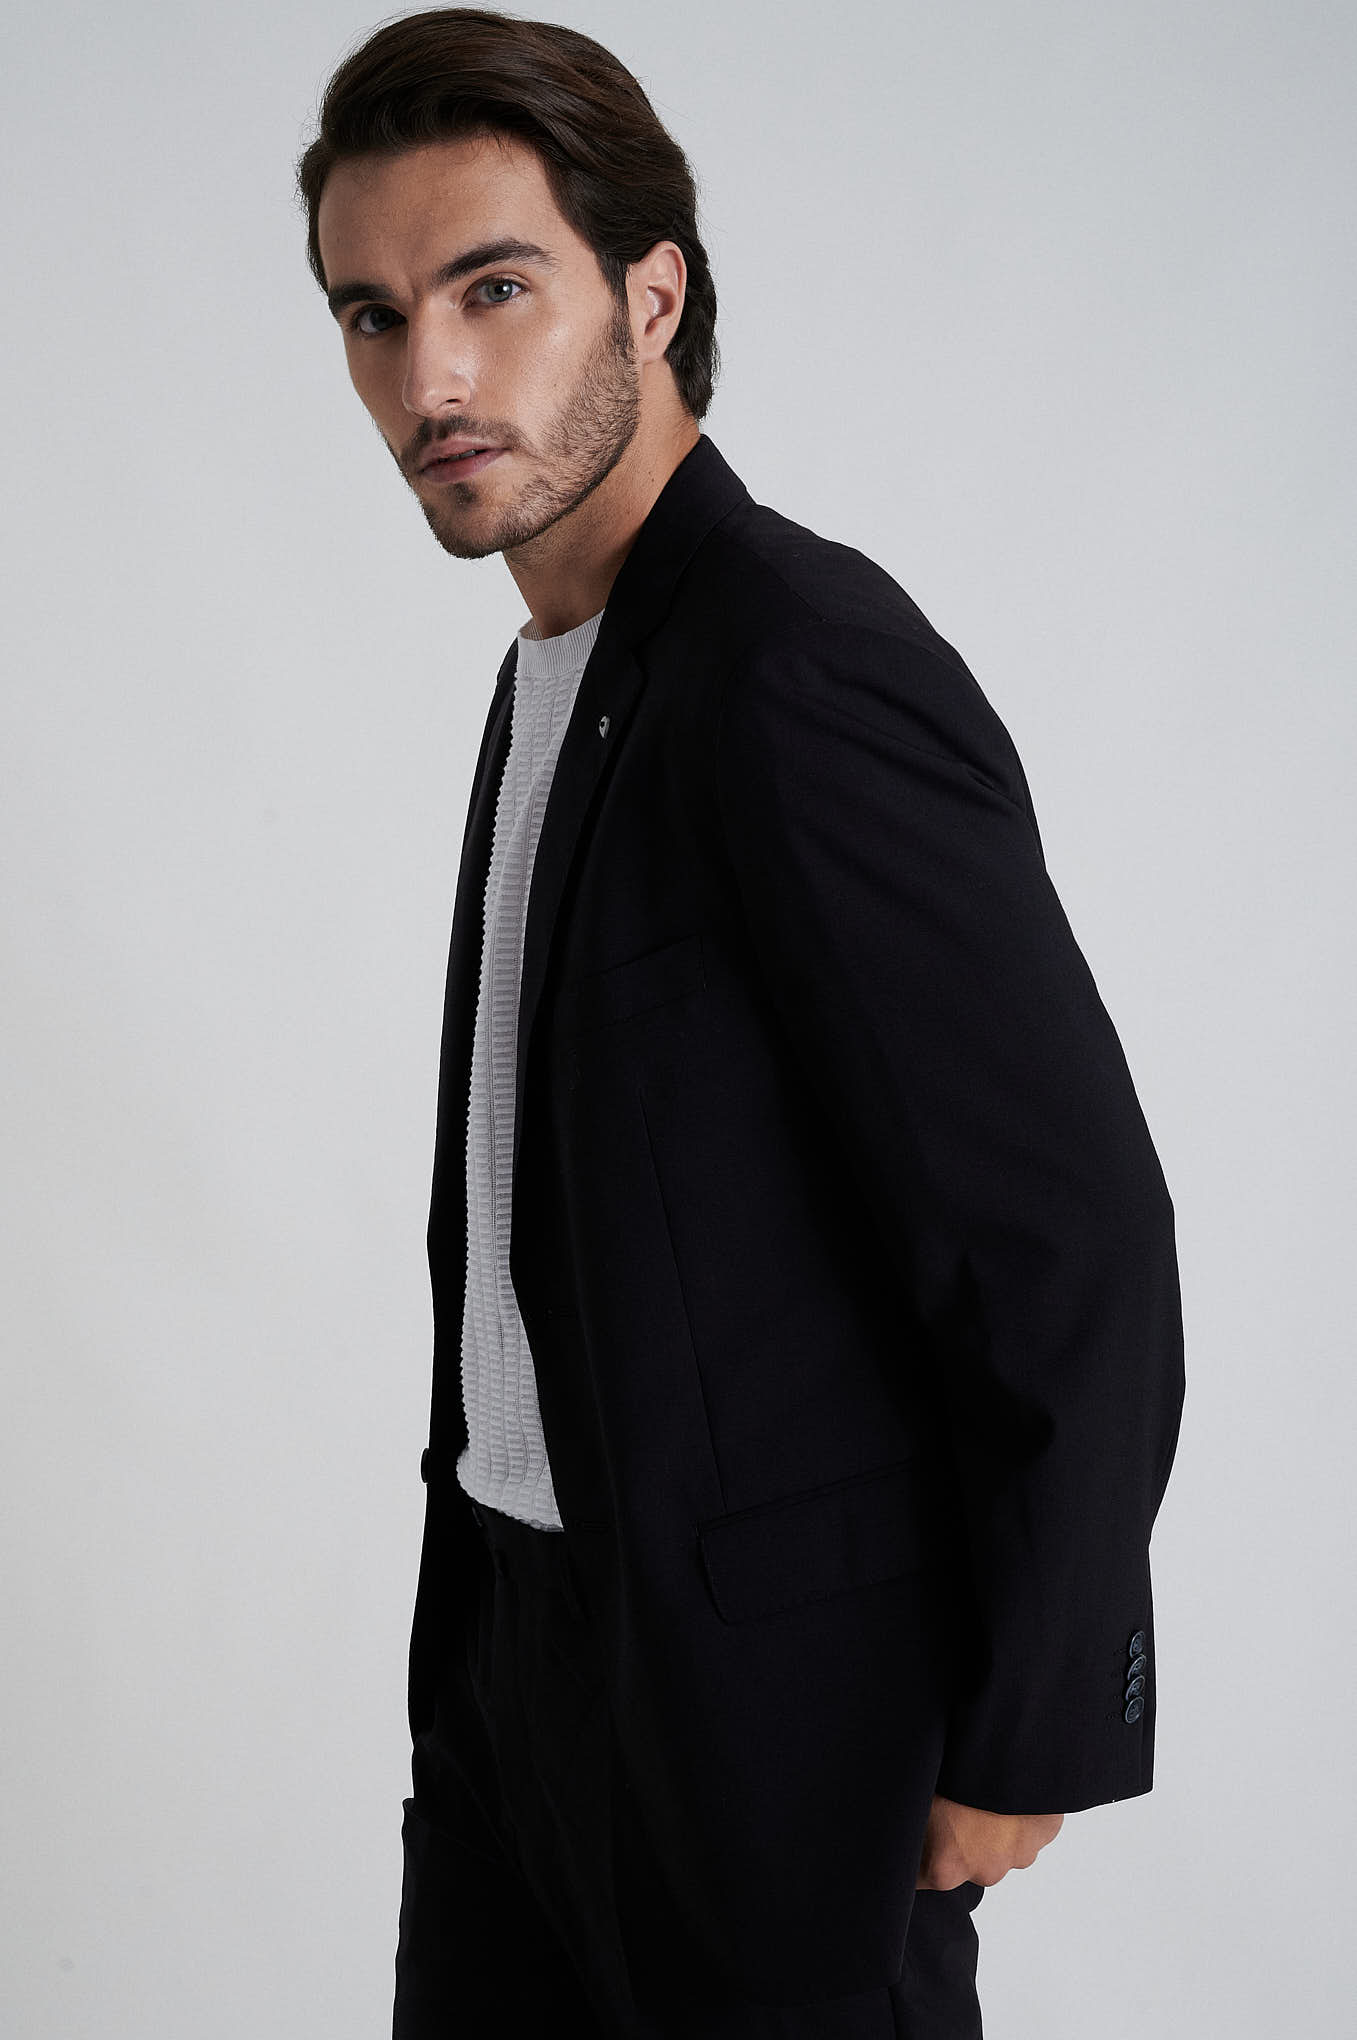 Suit Black Formal Man